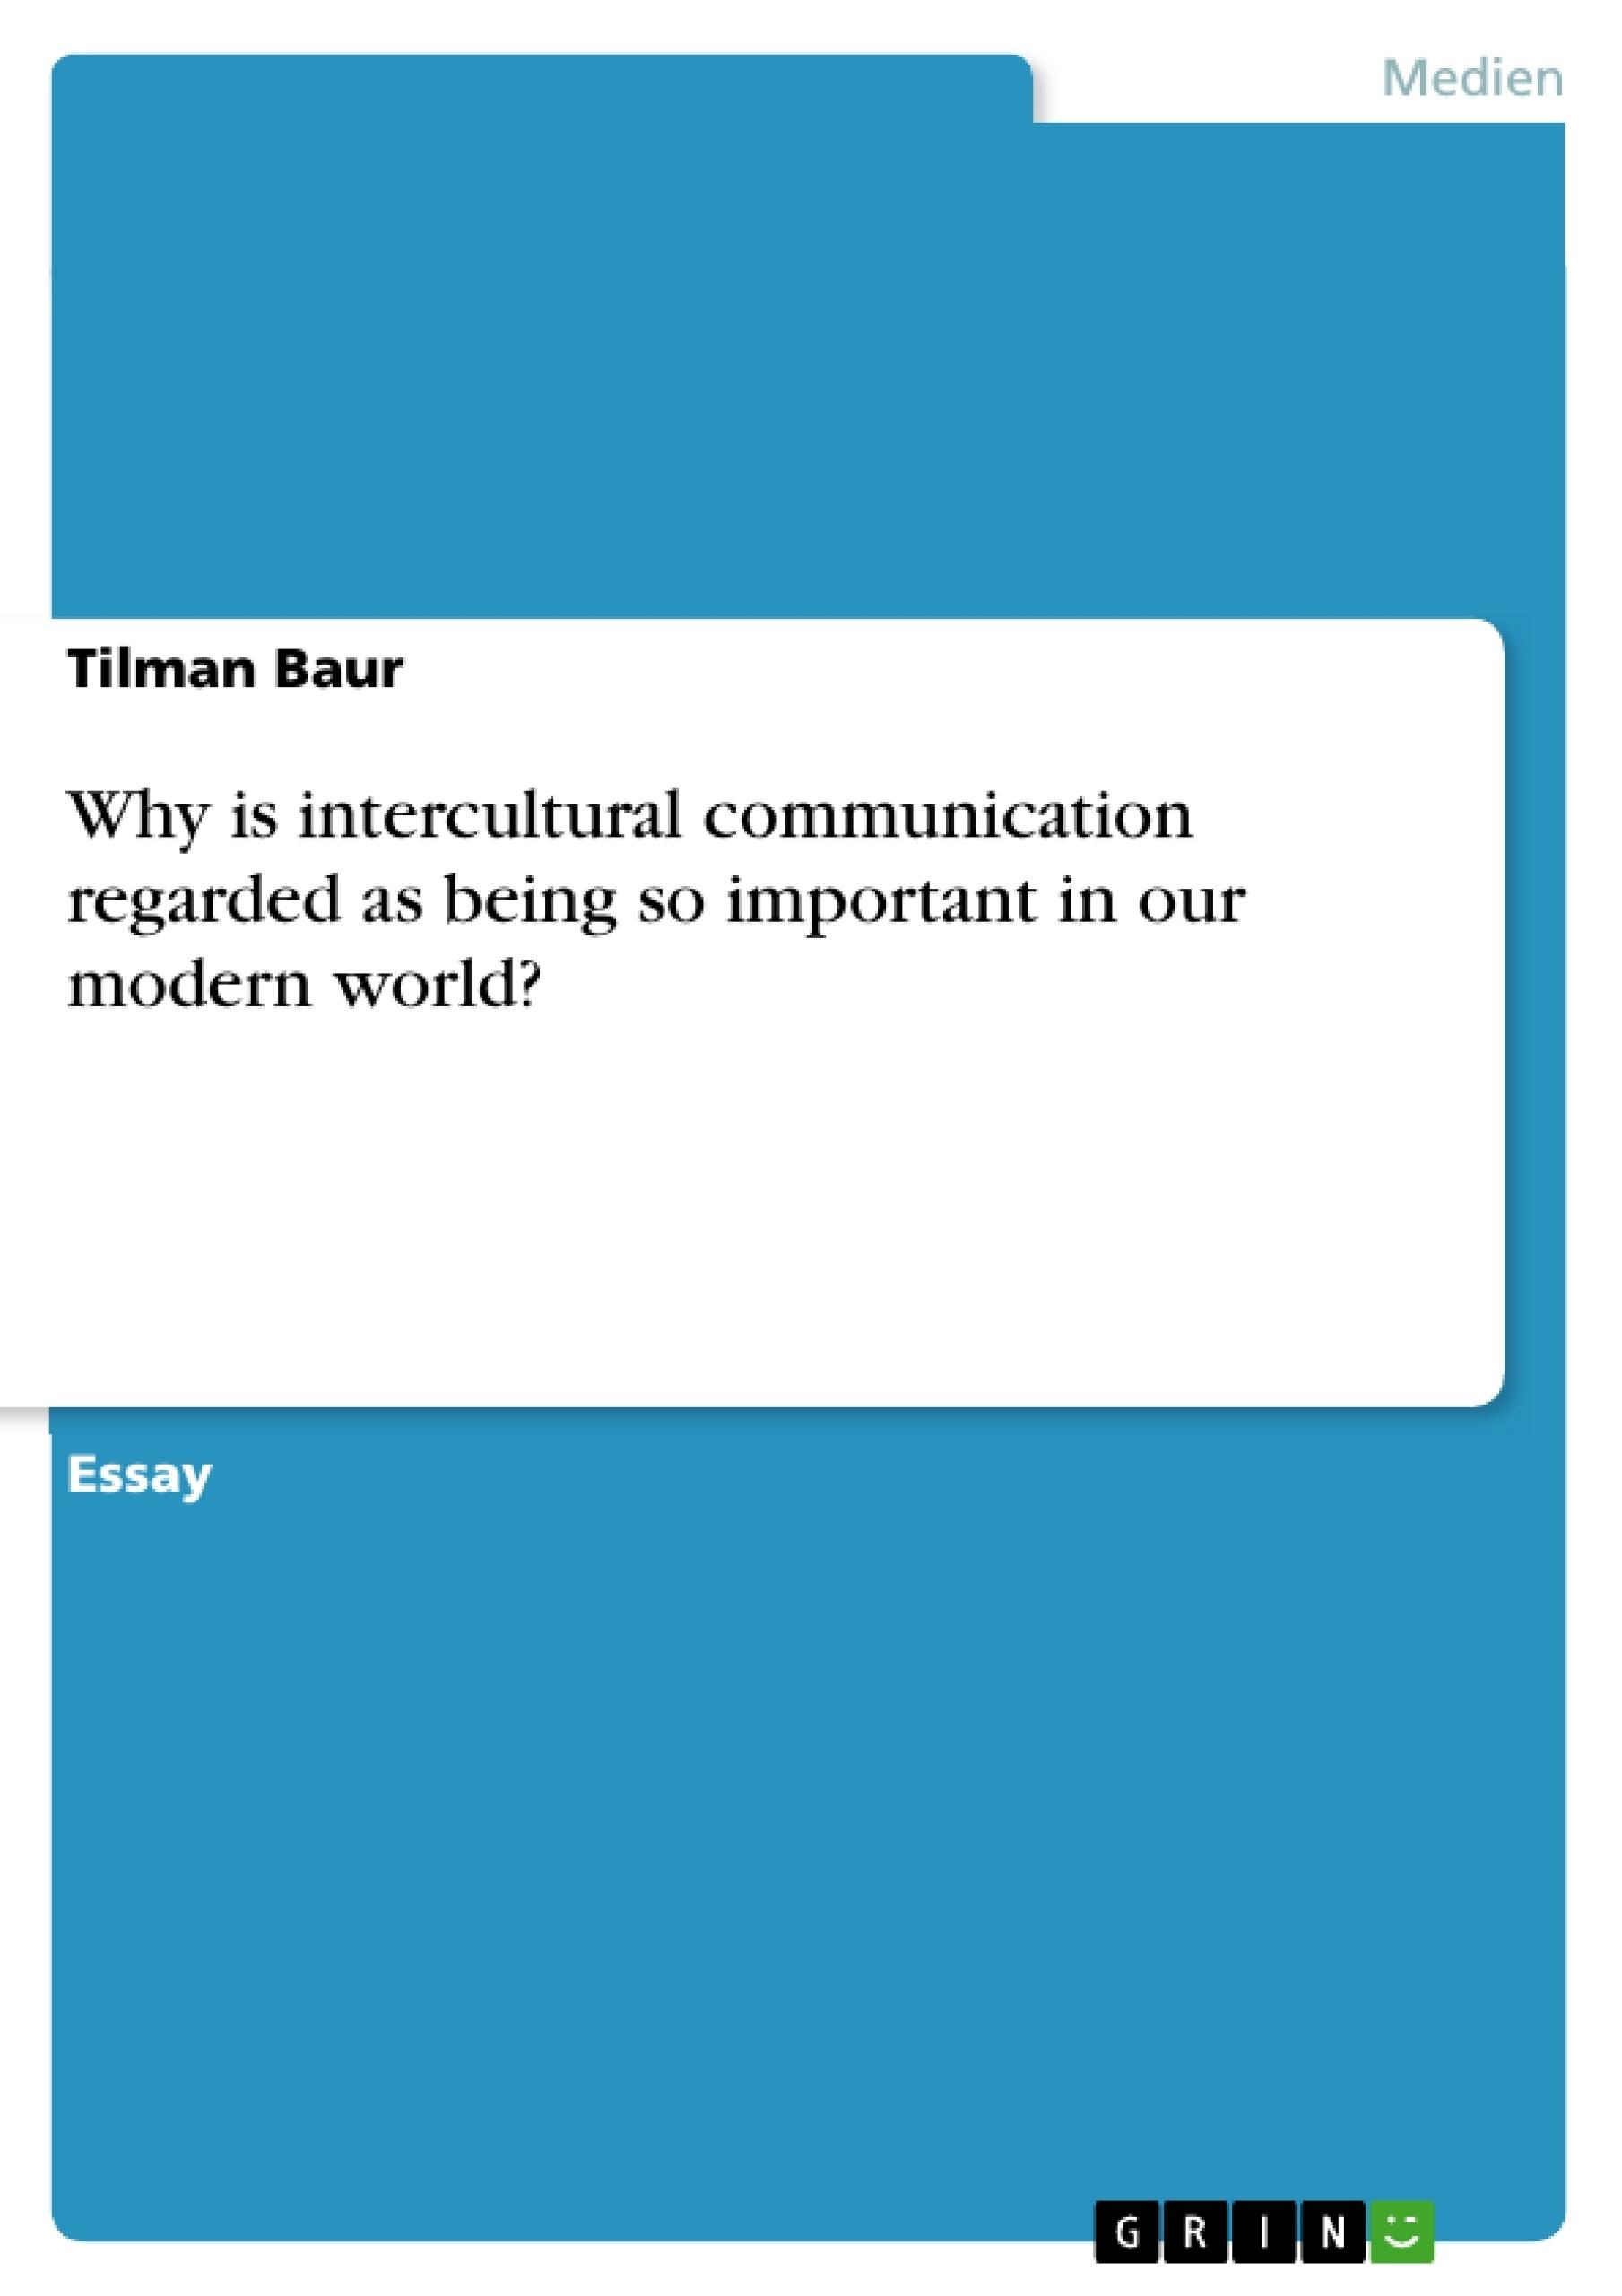 Case Study: Intercultural Communication Essay